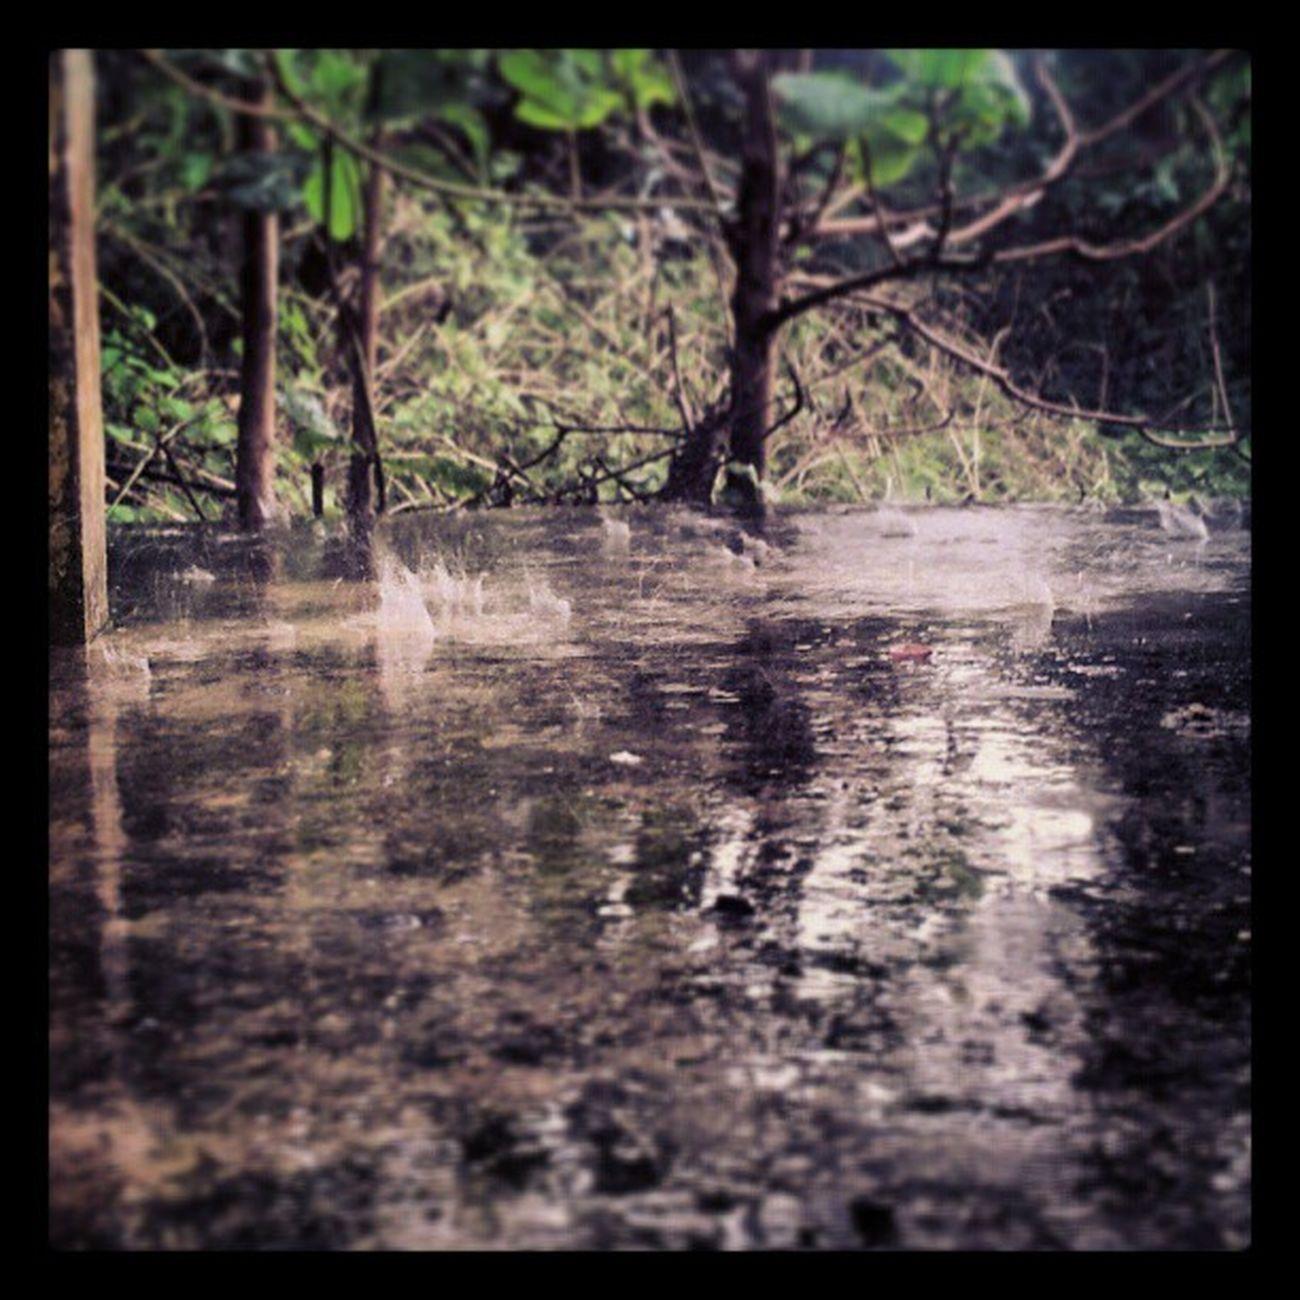 rain rain go away come again another day Raining Sambuisland Raindrops Instaphoto